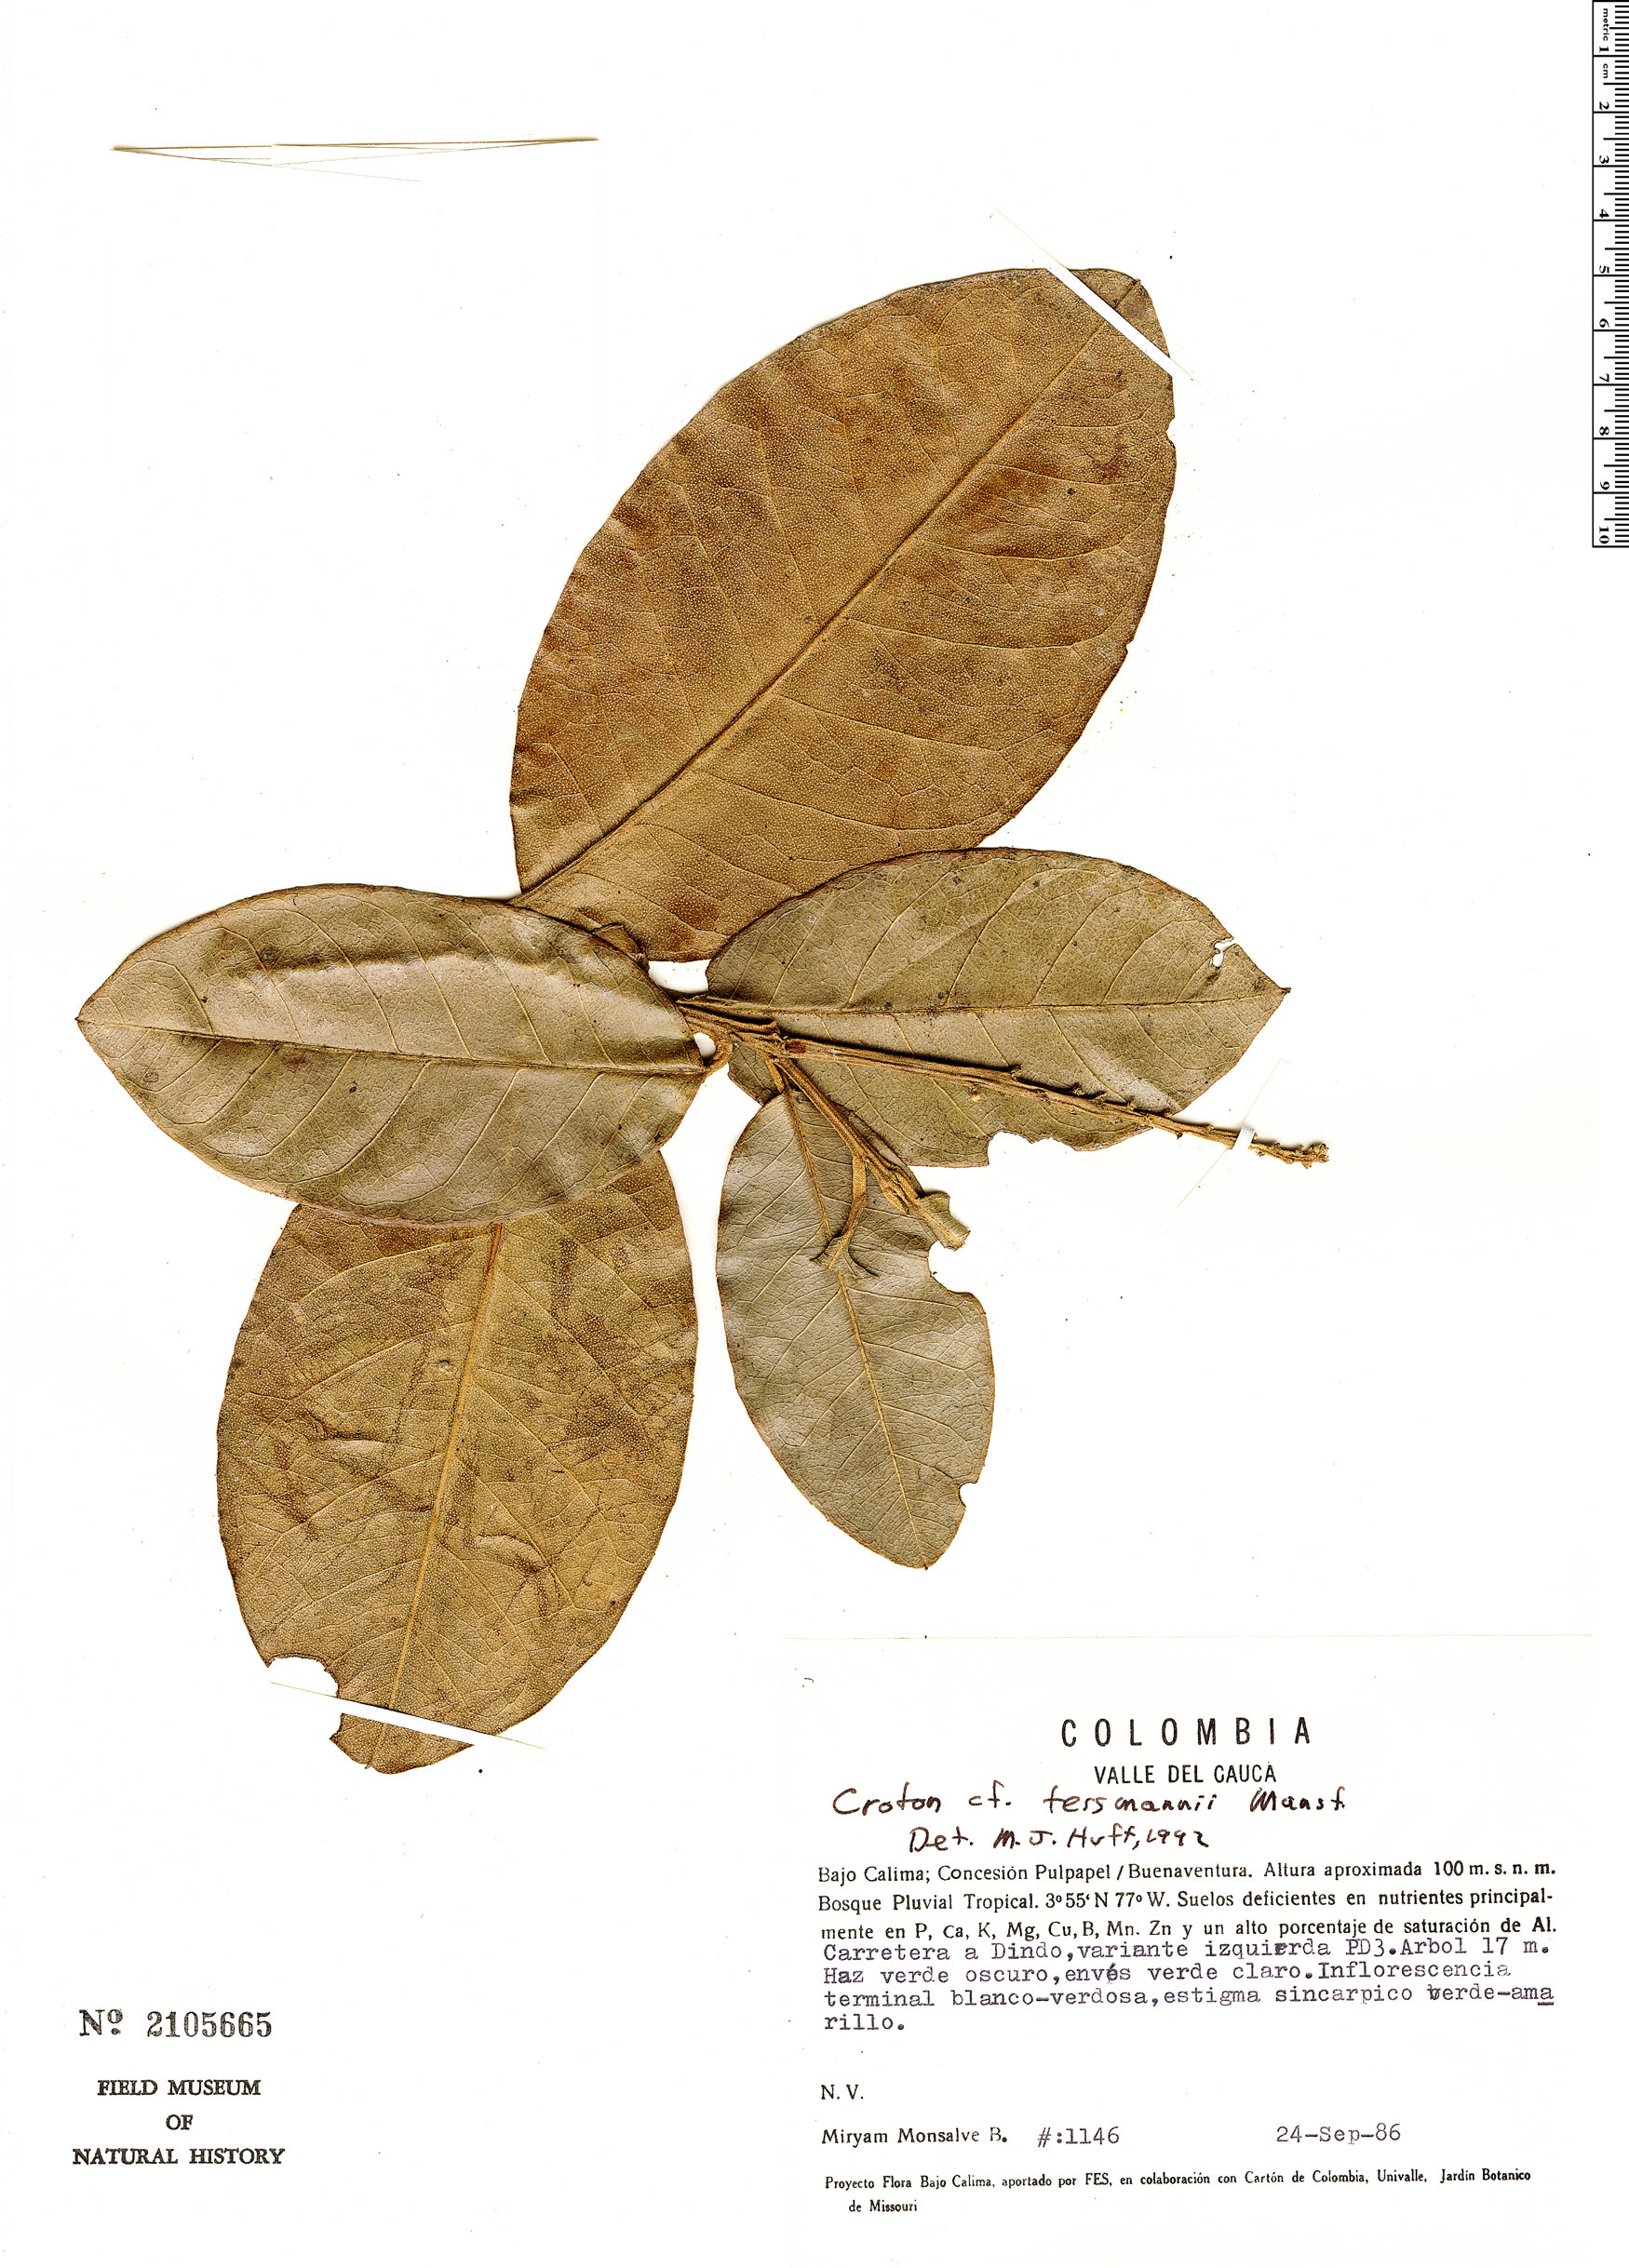 Specimen: Croton jorgei